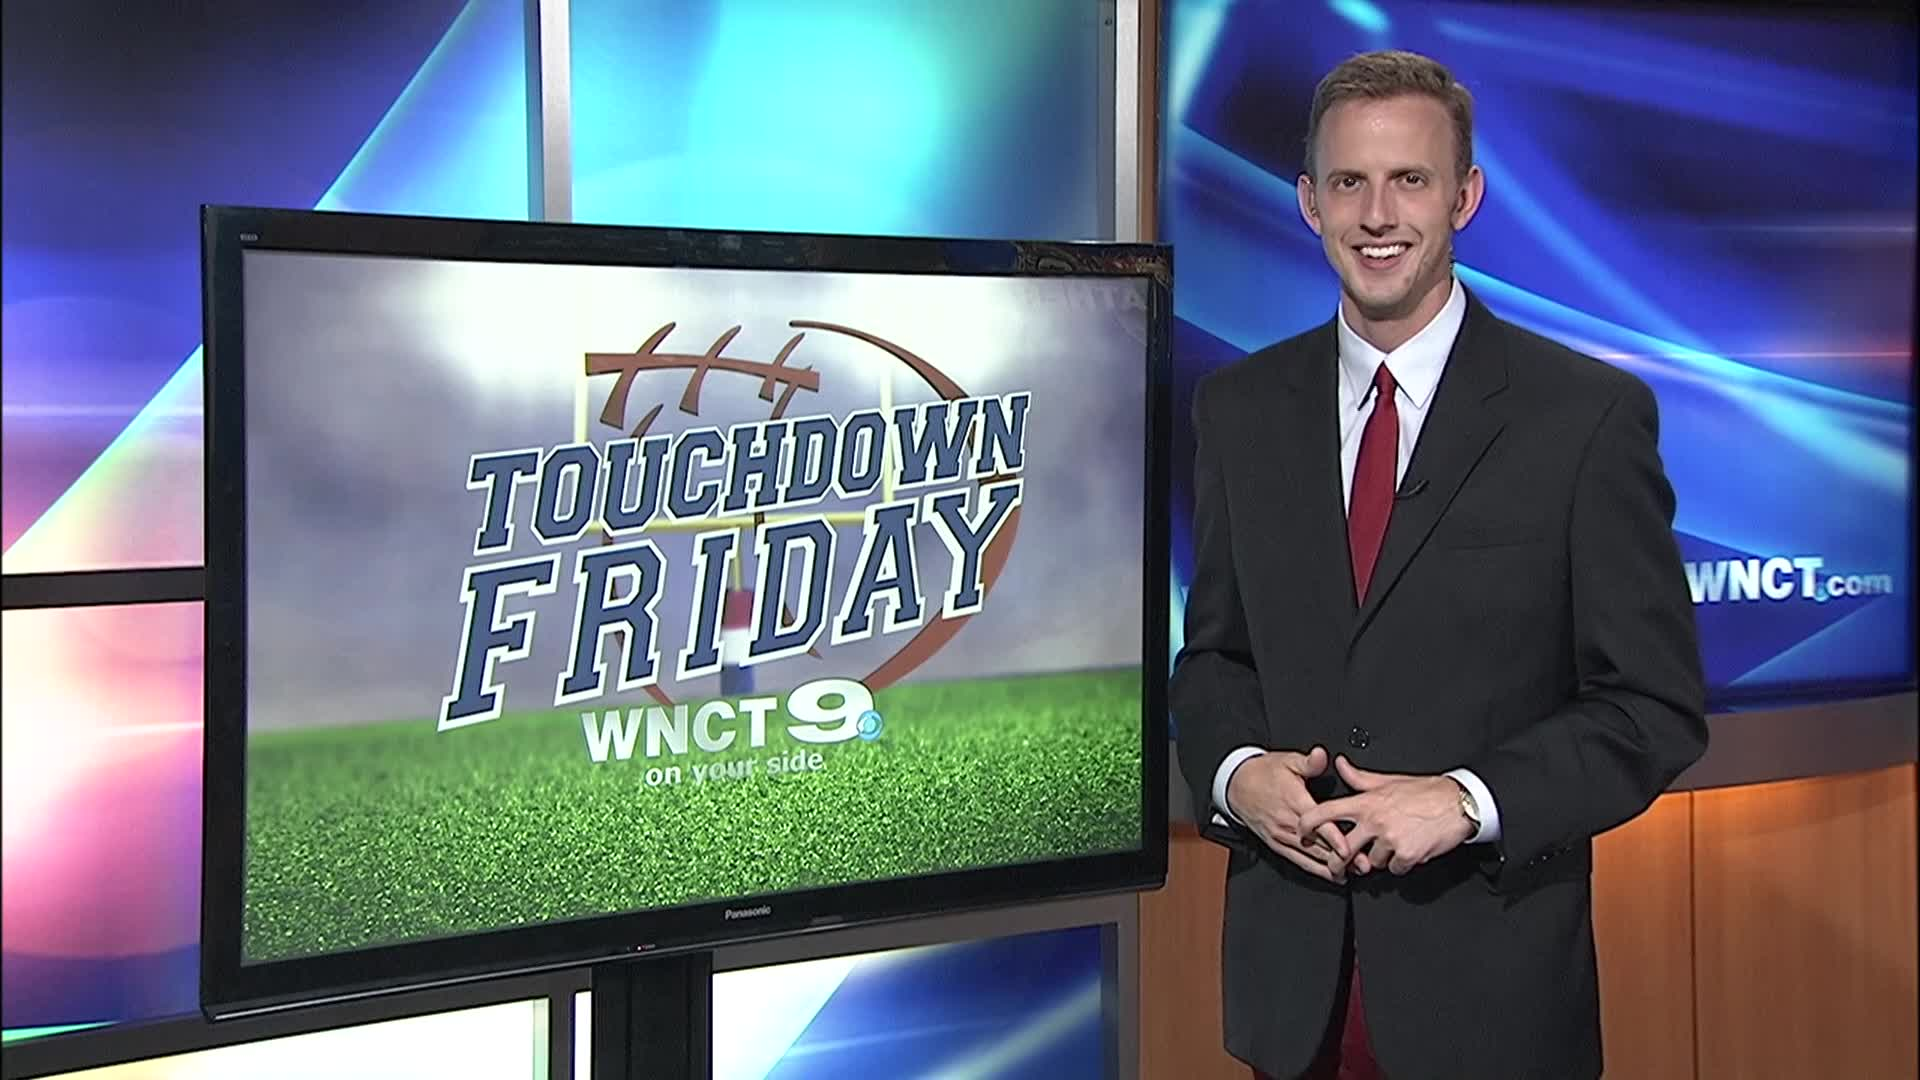 Jacksonville vs New Bern - Week 4